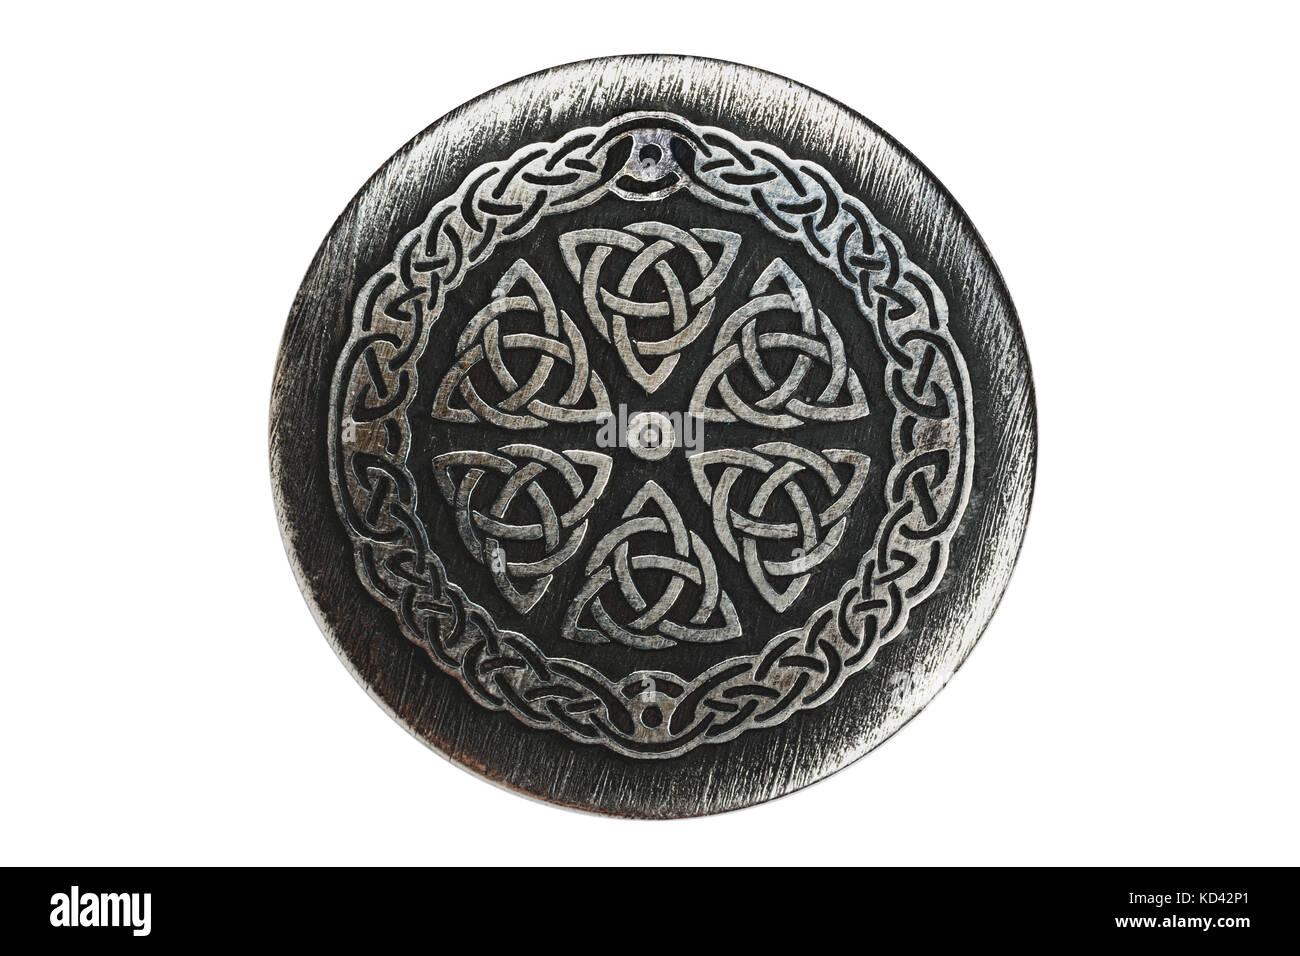 Trinity. The ancient symbol - Stock Image